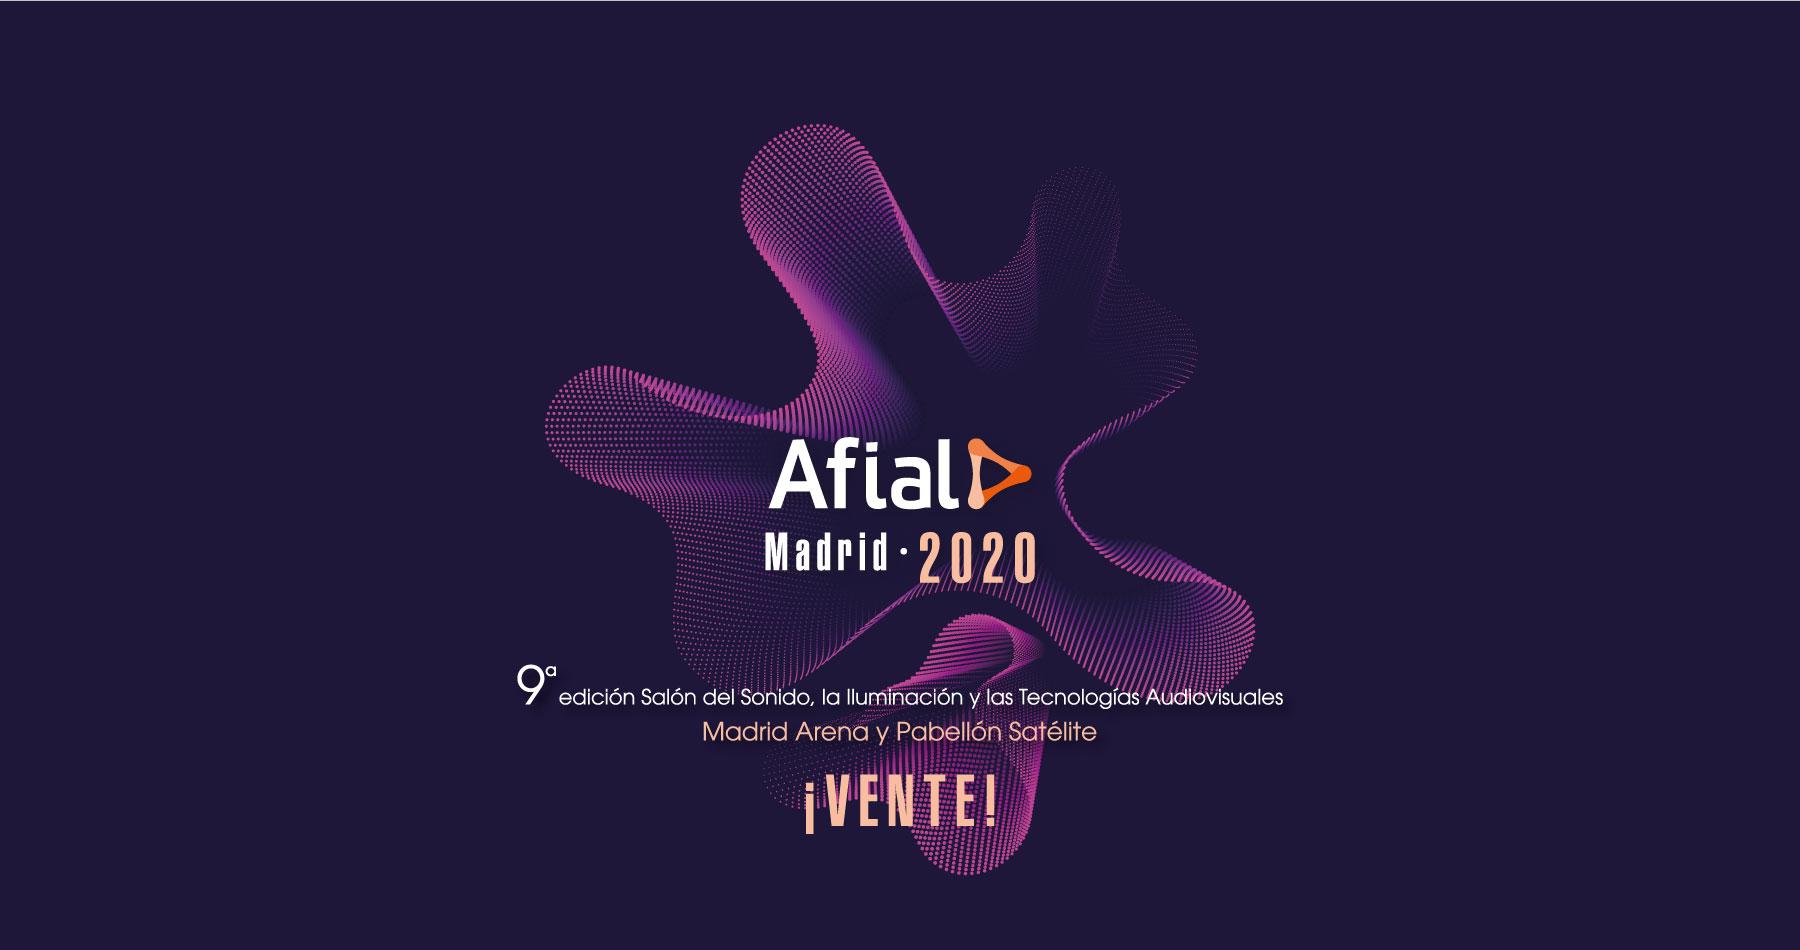 AFIAL - Association - Sound, Lighting and Audiovisual Technology